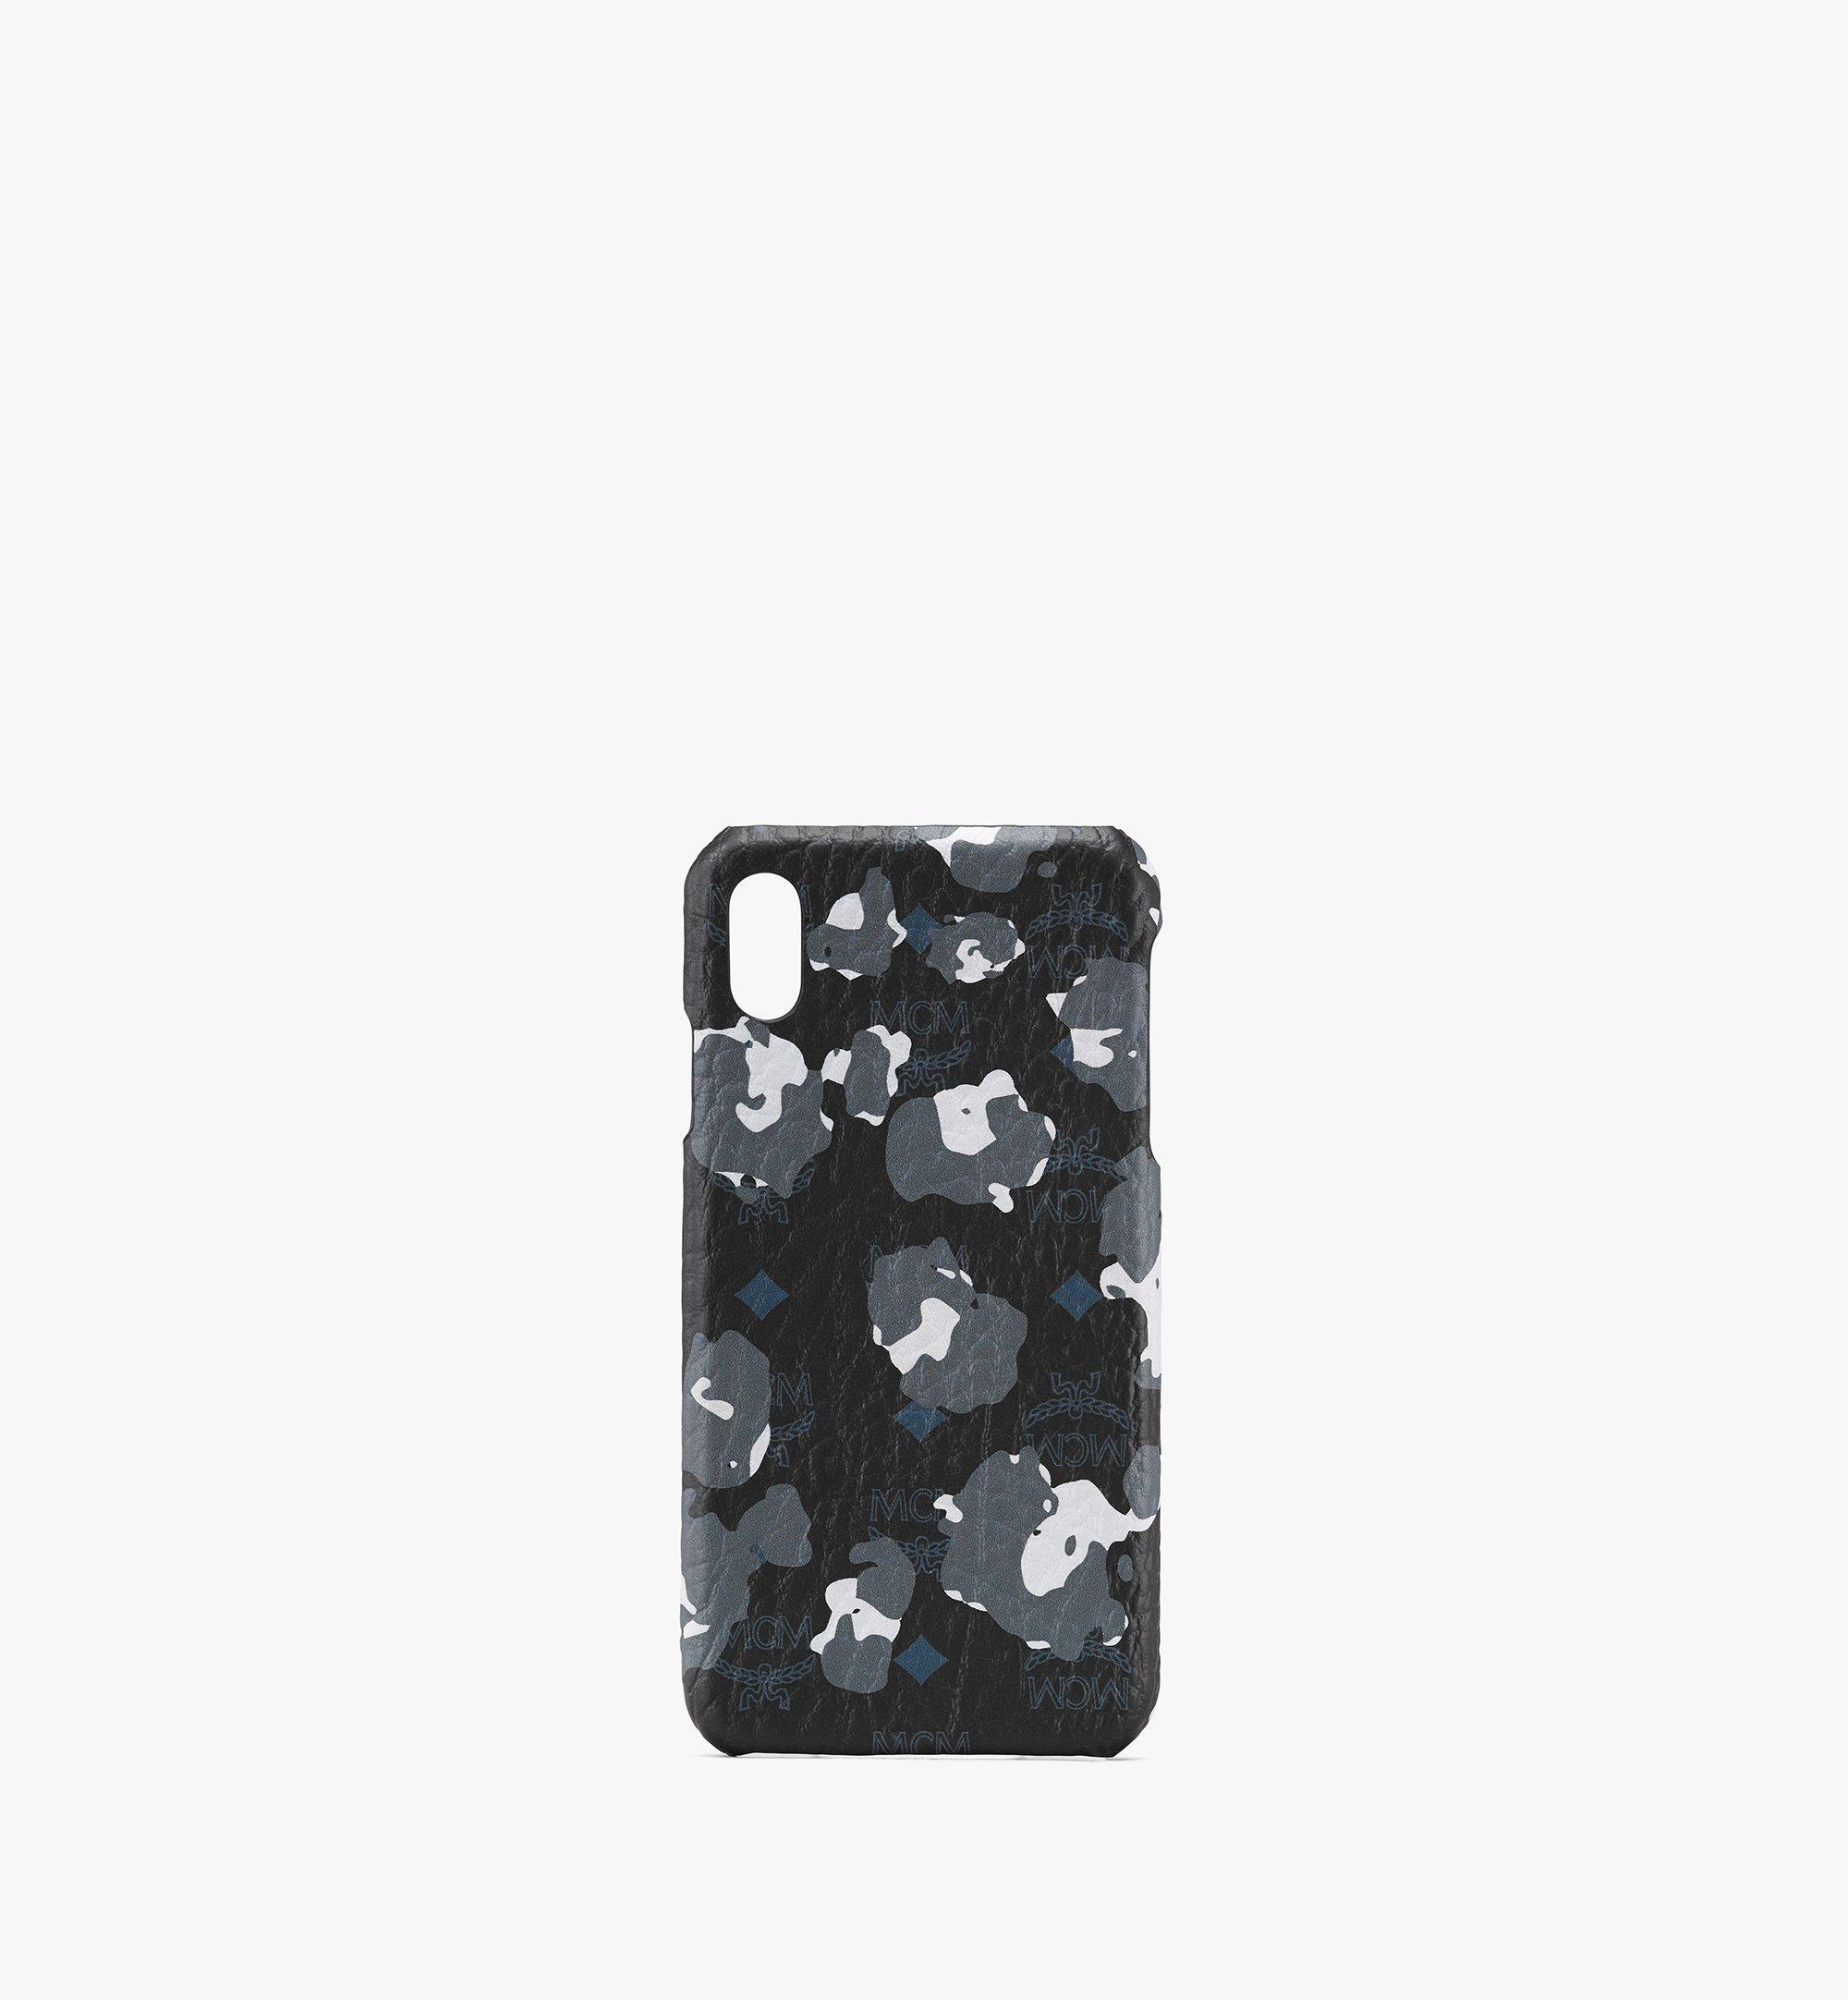 MCM 플로럴 레오파드 아이폰 케이스 Black MXEASLF02B1001 Alternate View 1